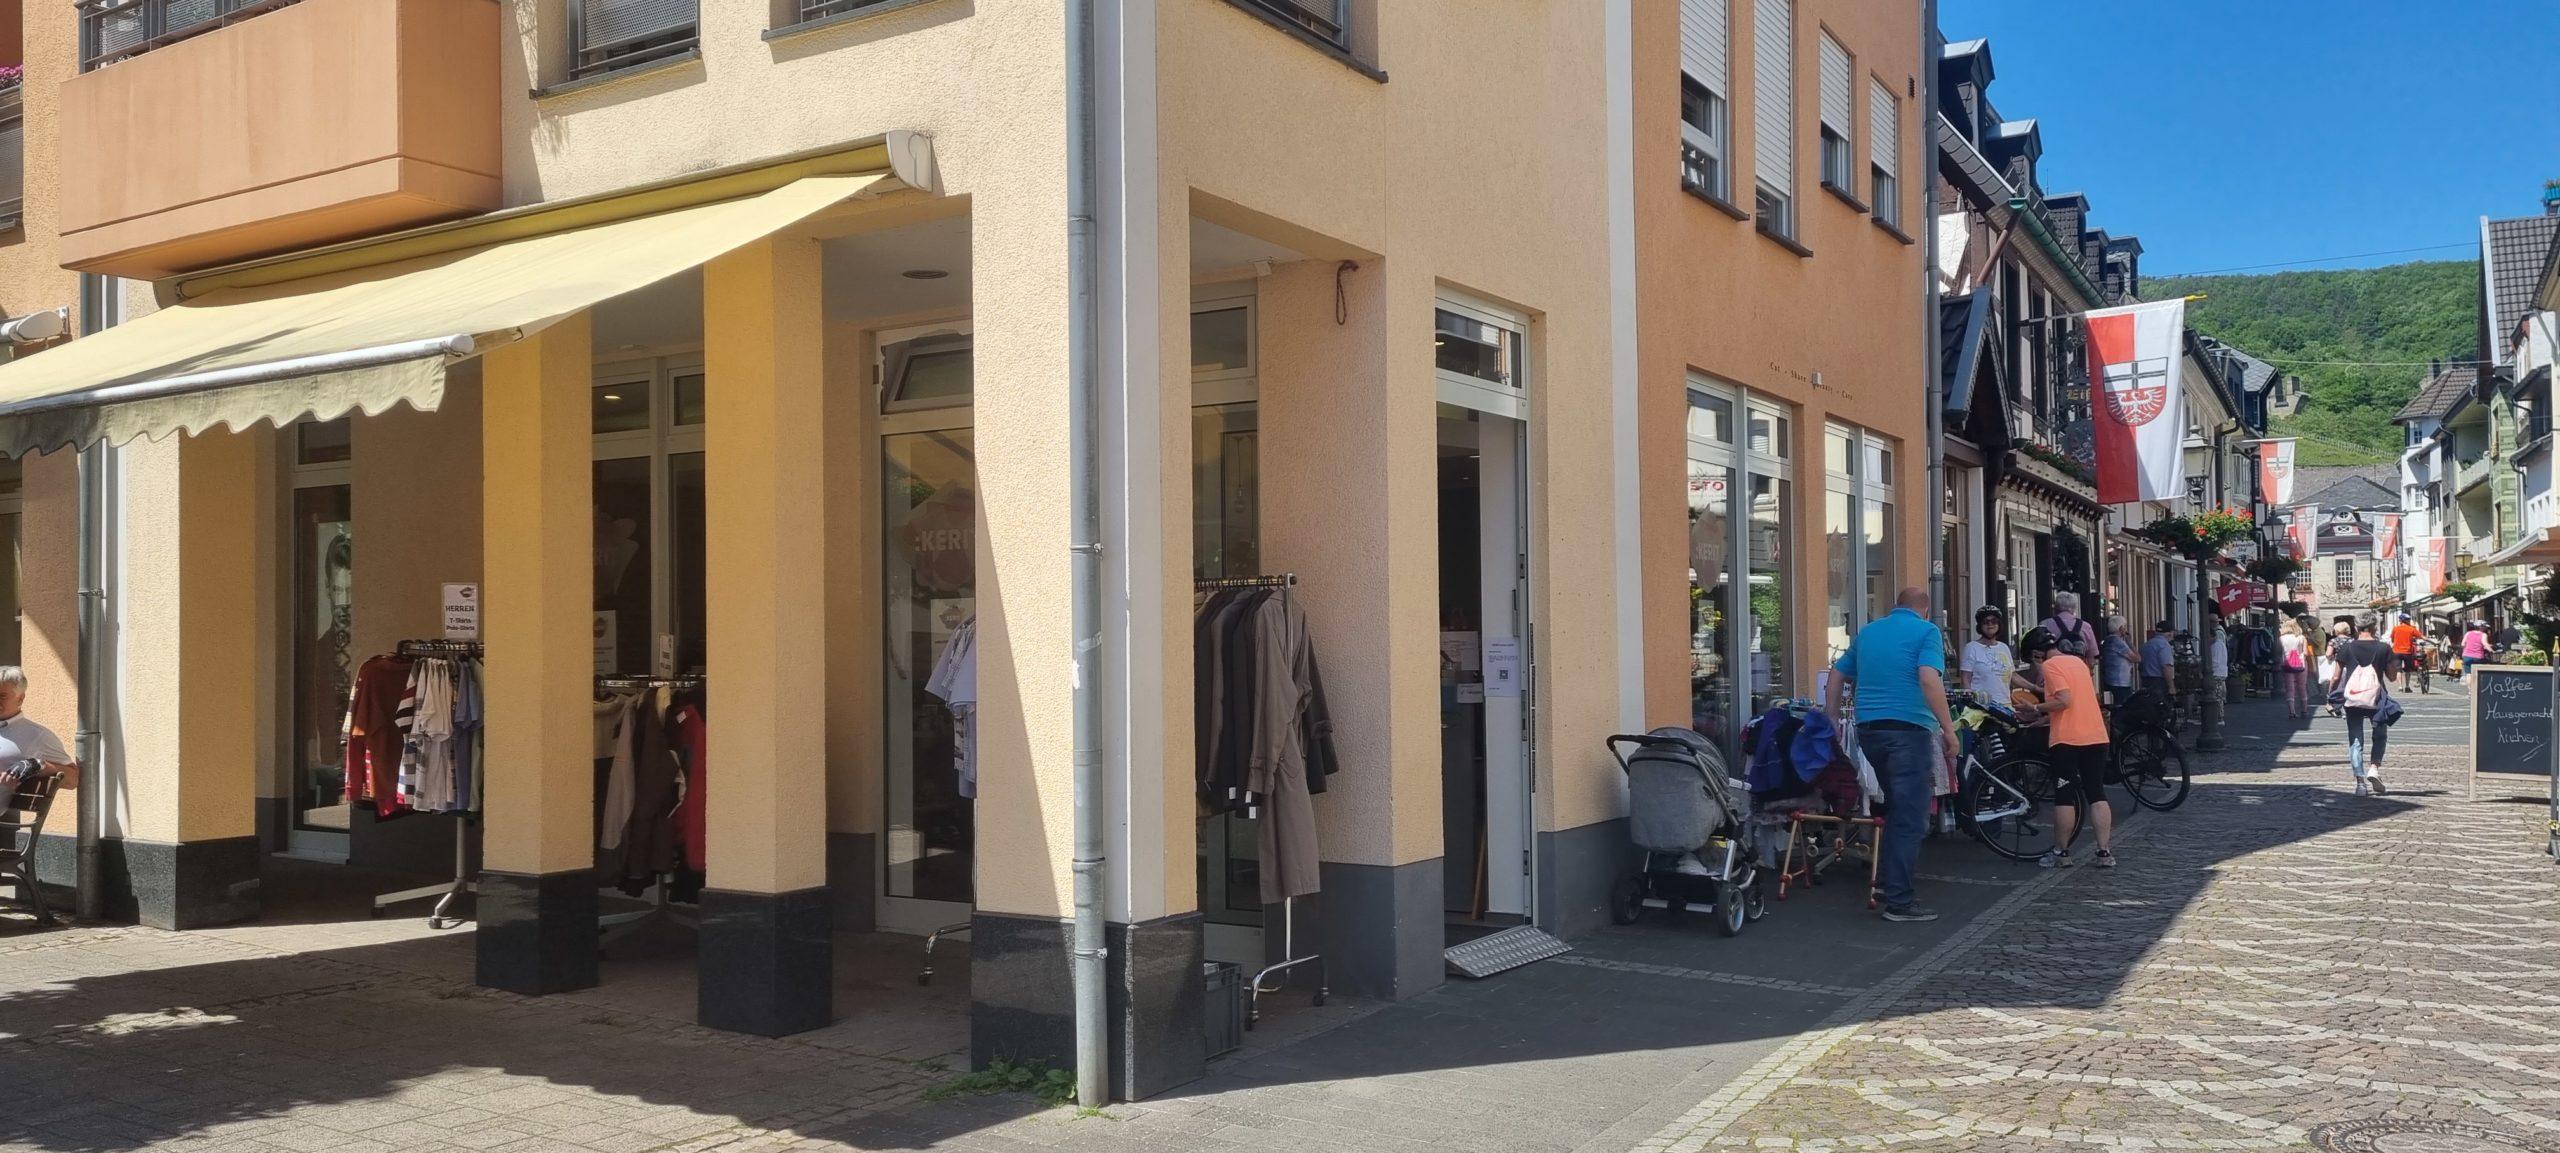 Ahrhutstraße 24